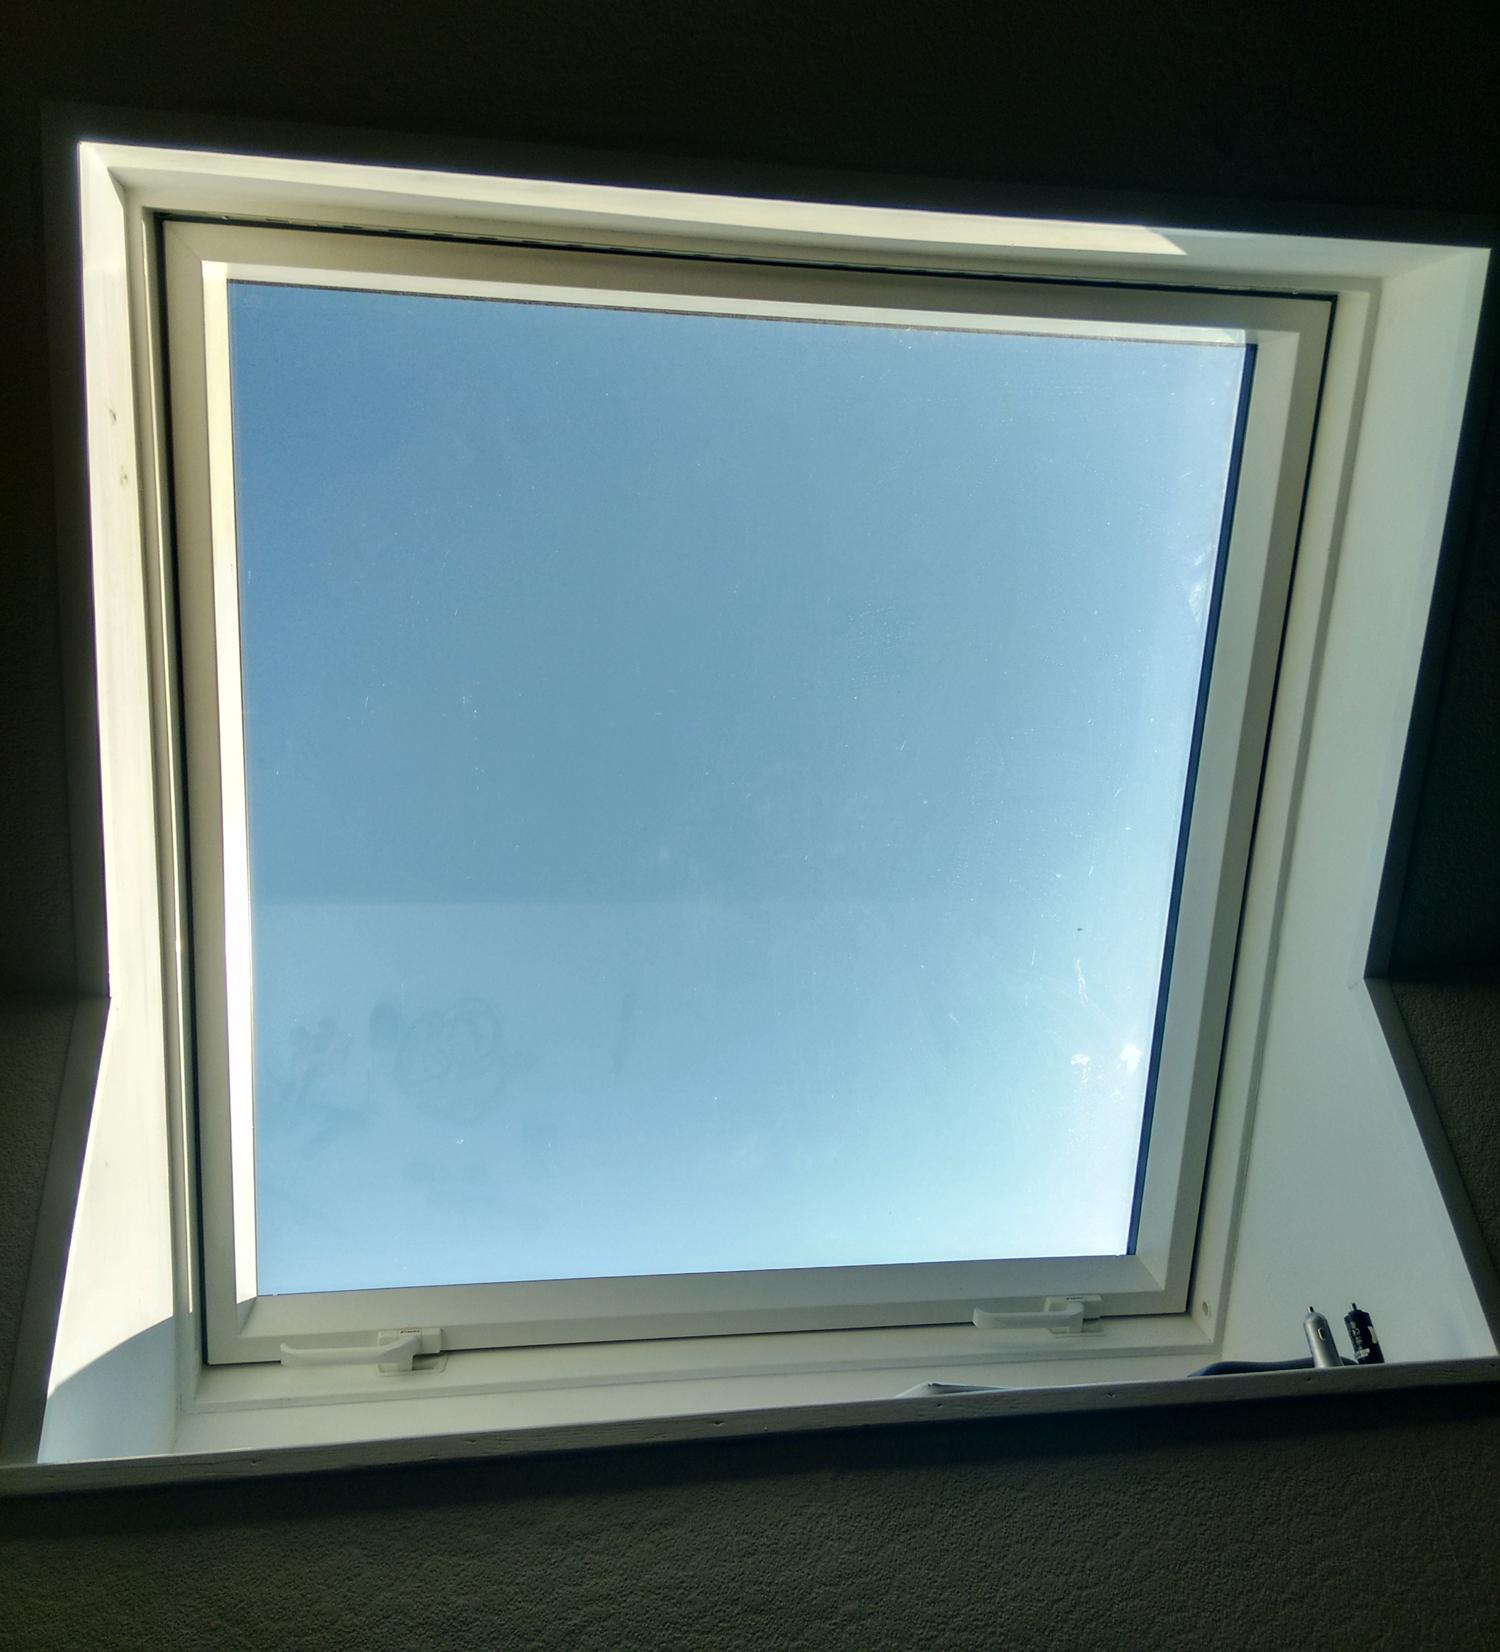 Internal shot of closed PVC roof window